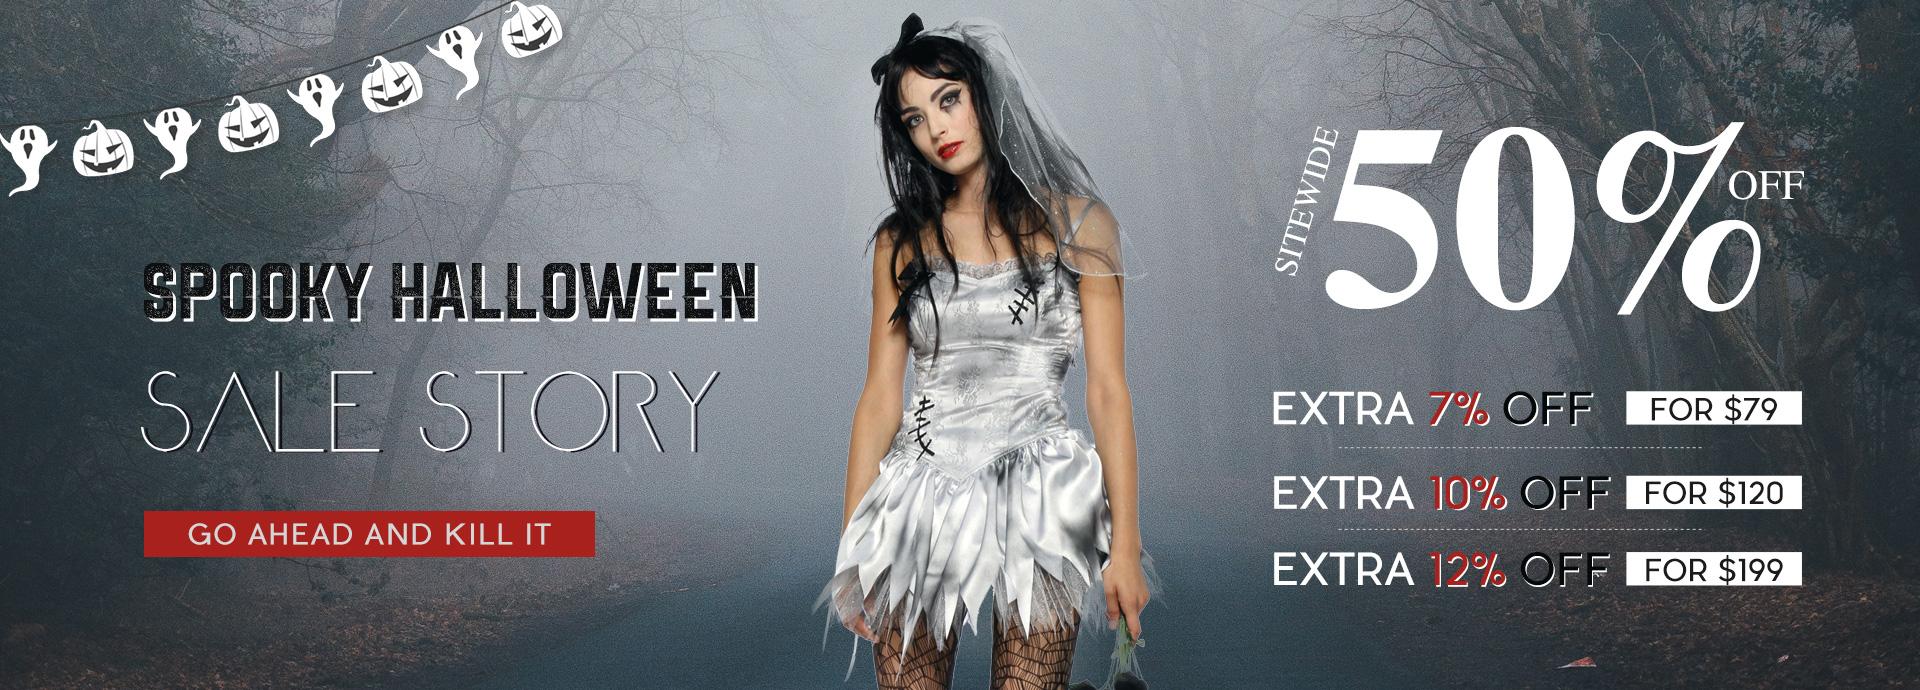 Spooky Halloween Sale Story